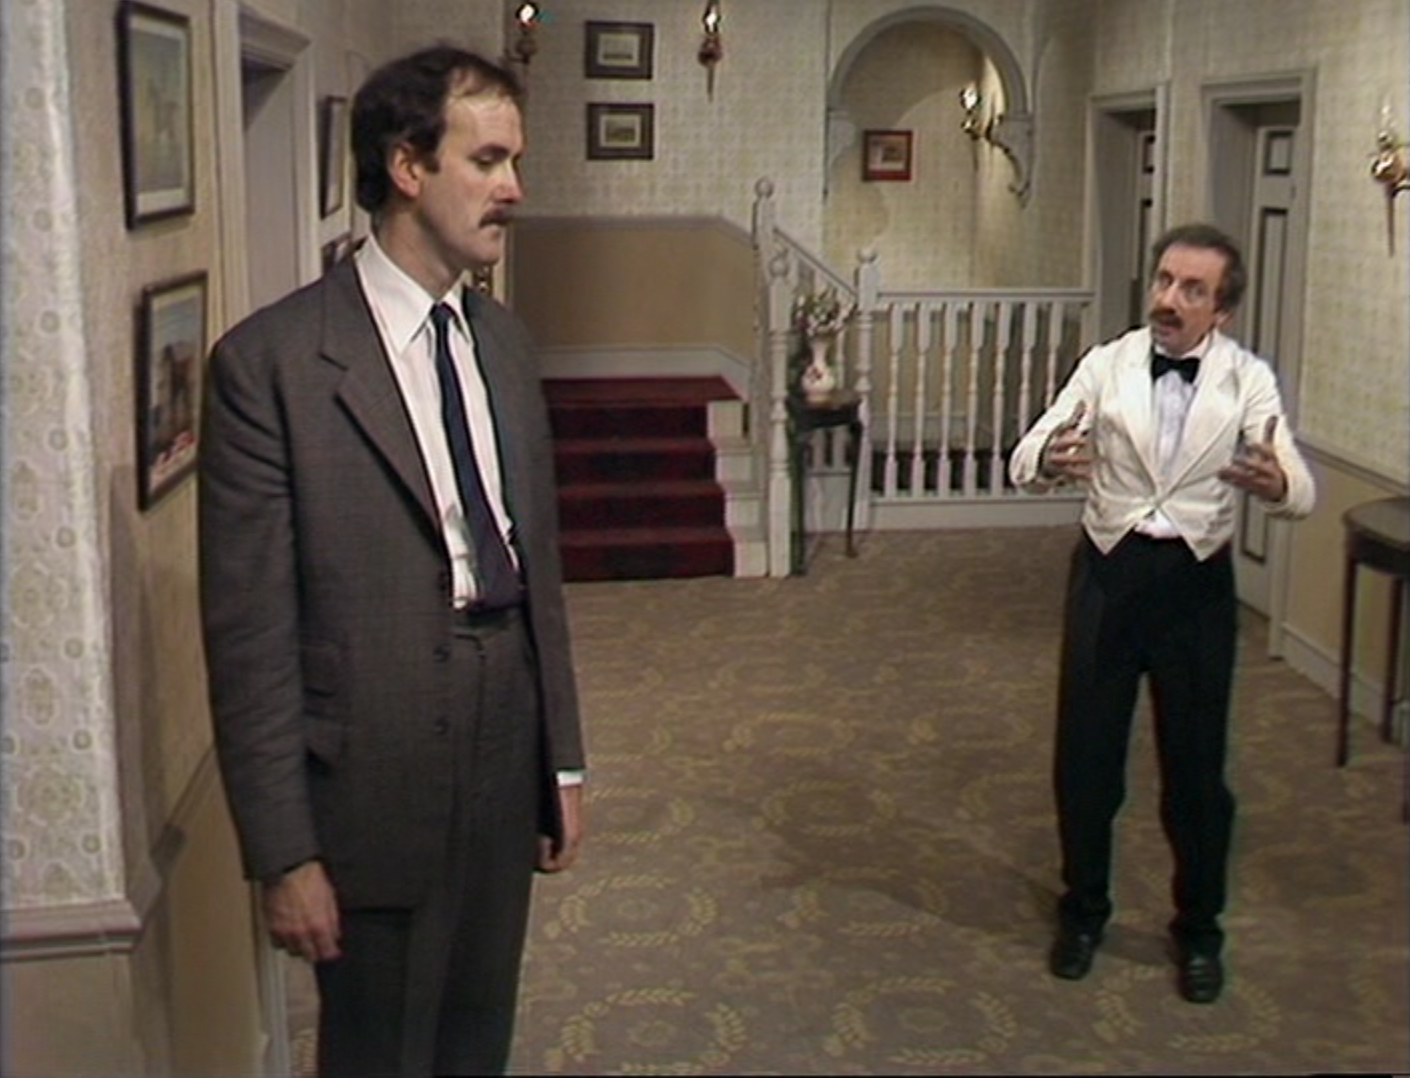 fawlty towers 自己还mark下来想要看,没想到现在反而是因为mr jones而迷上了~ 伦敦charing cross hotel里定期举办fawlty towers主题晚宴,两小时的半即兴表演+3 course meal,墙.